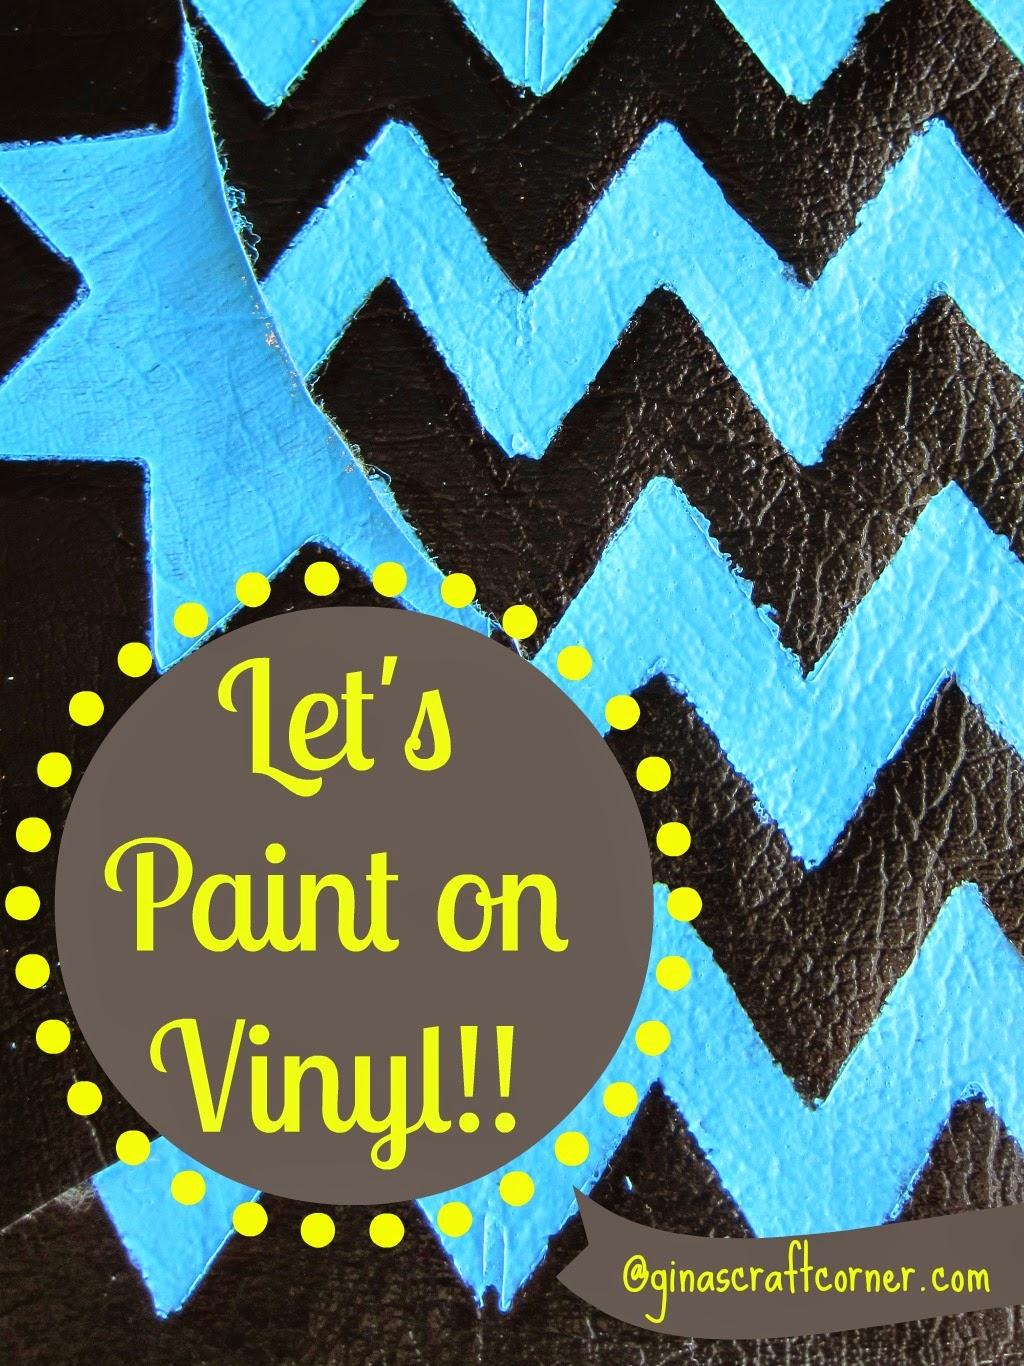 How to Paint on Vinyl-TUTORIAL